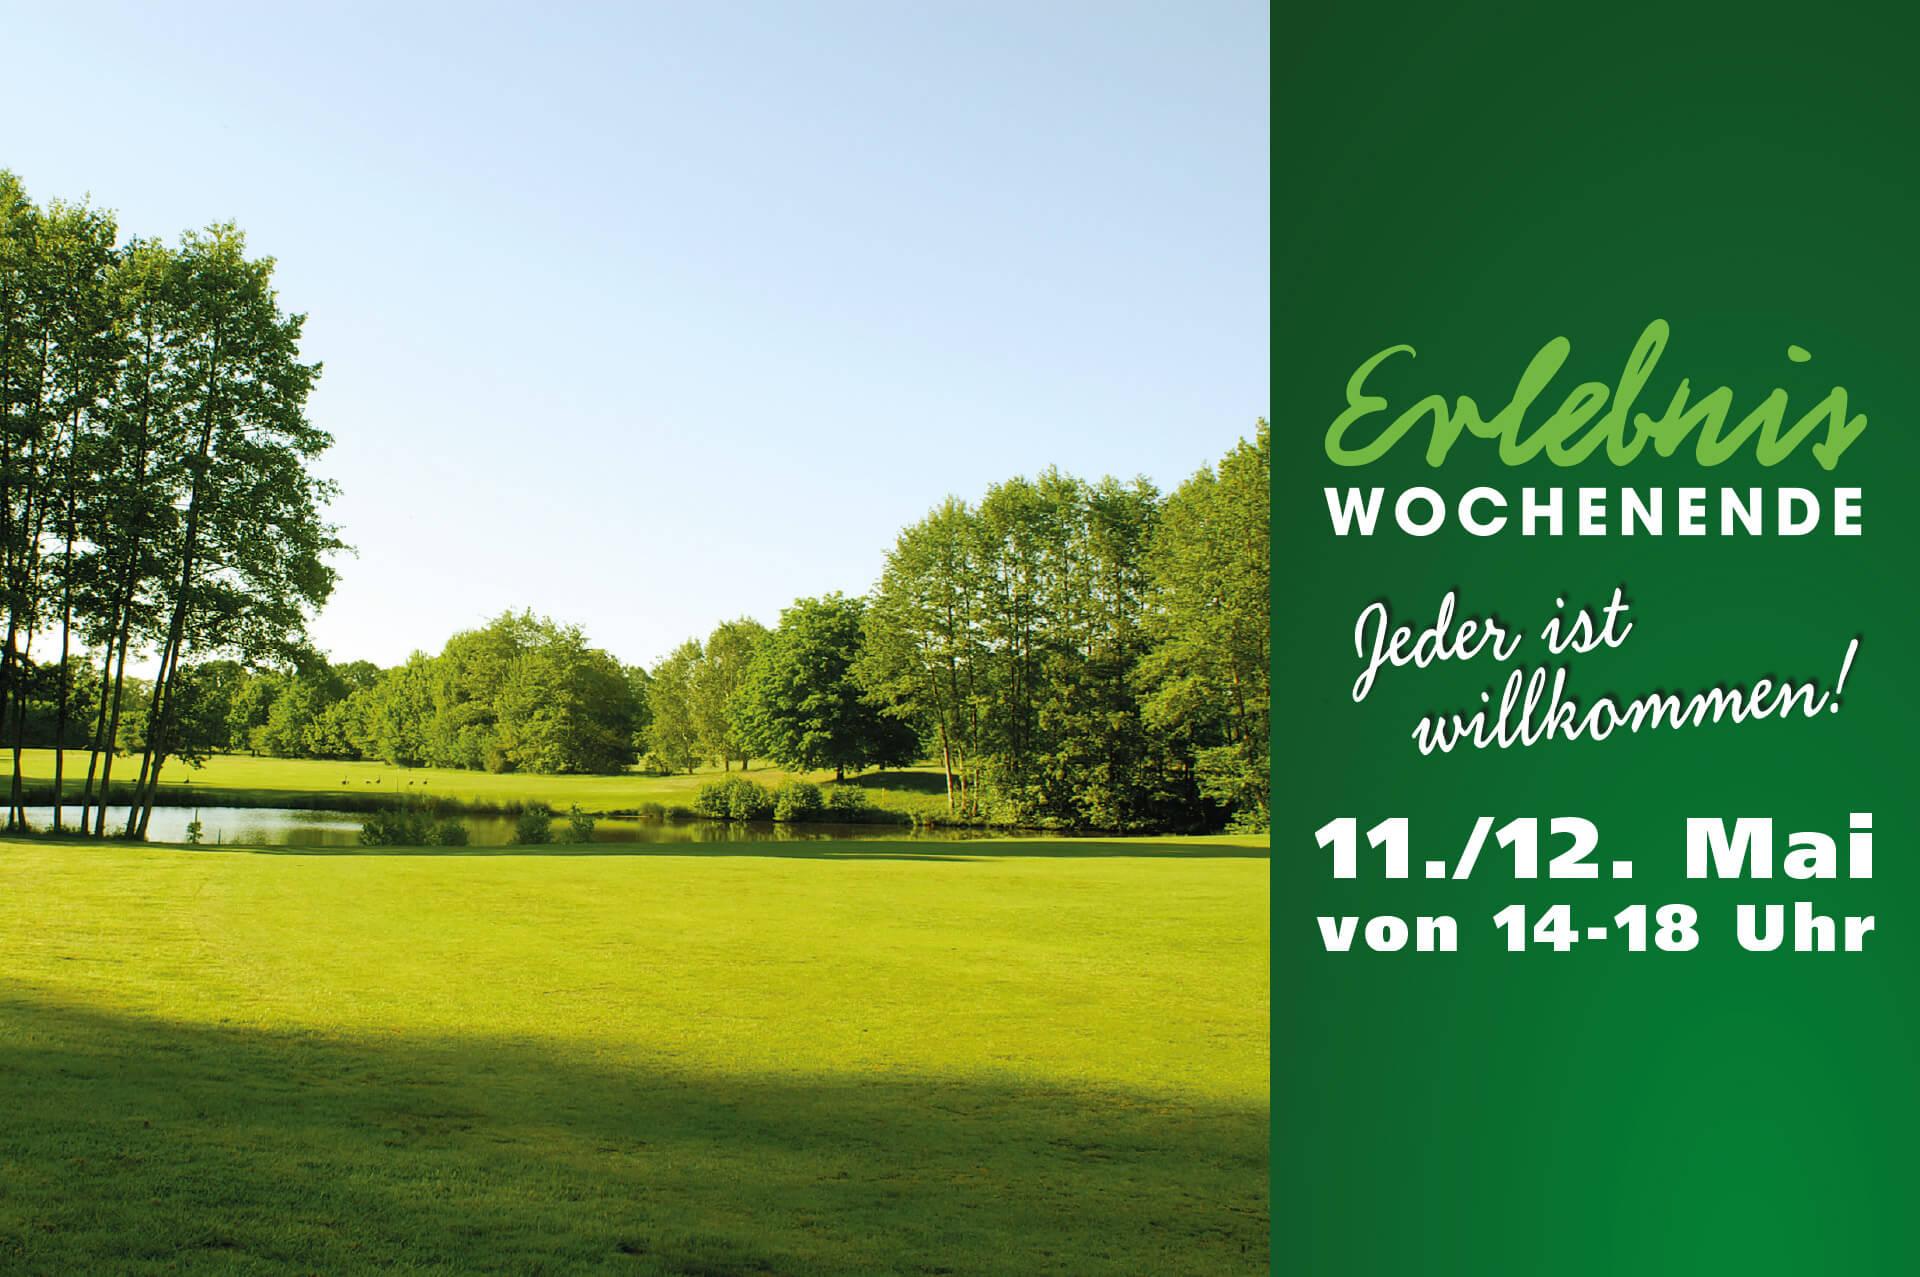 https://golfclub-peckeloh.de/wp-content/uploads/2019/04/header-1.jpg